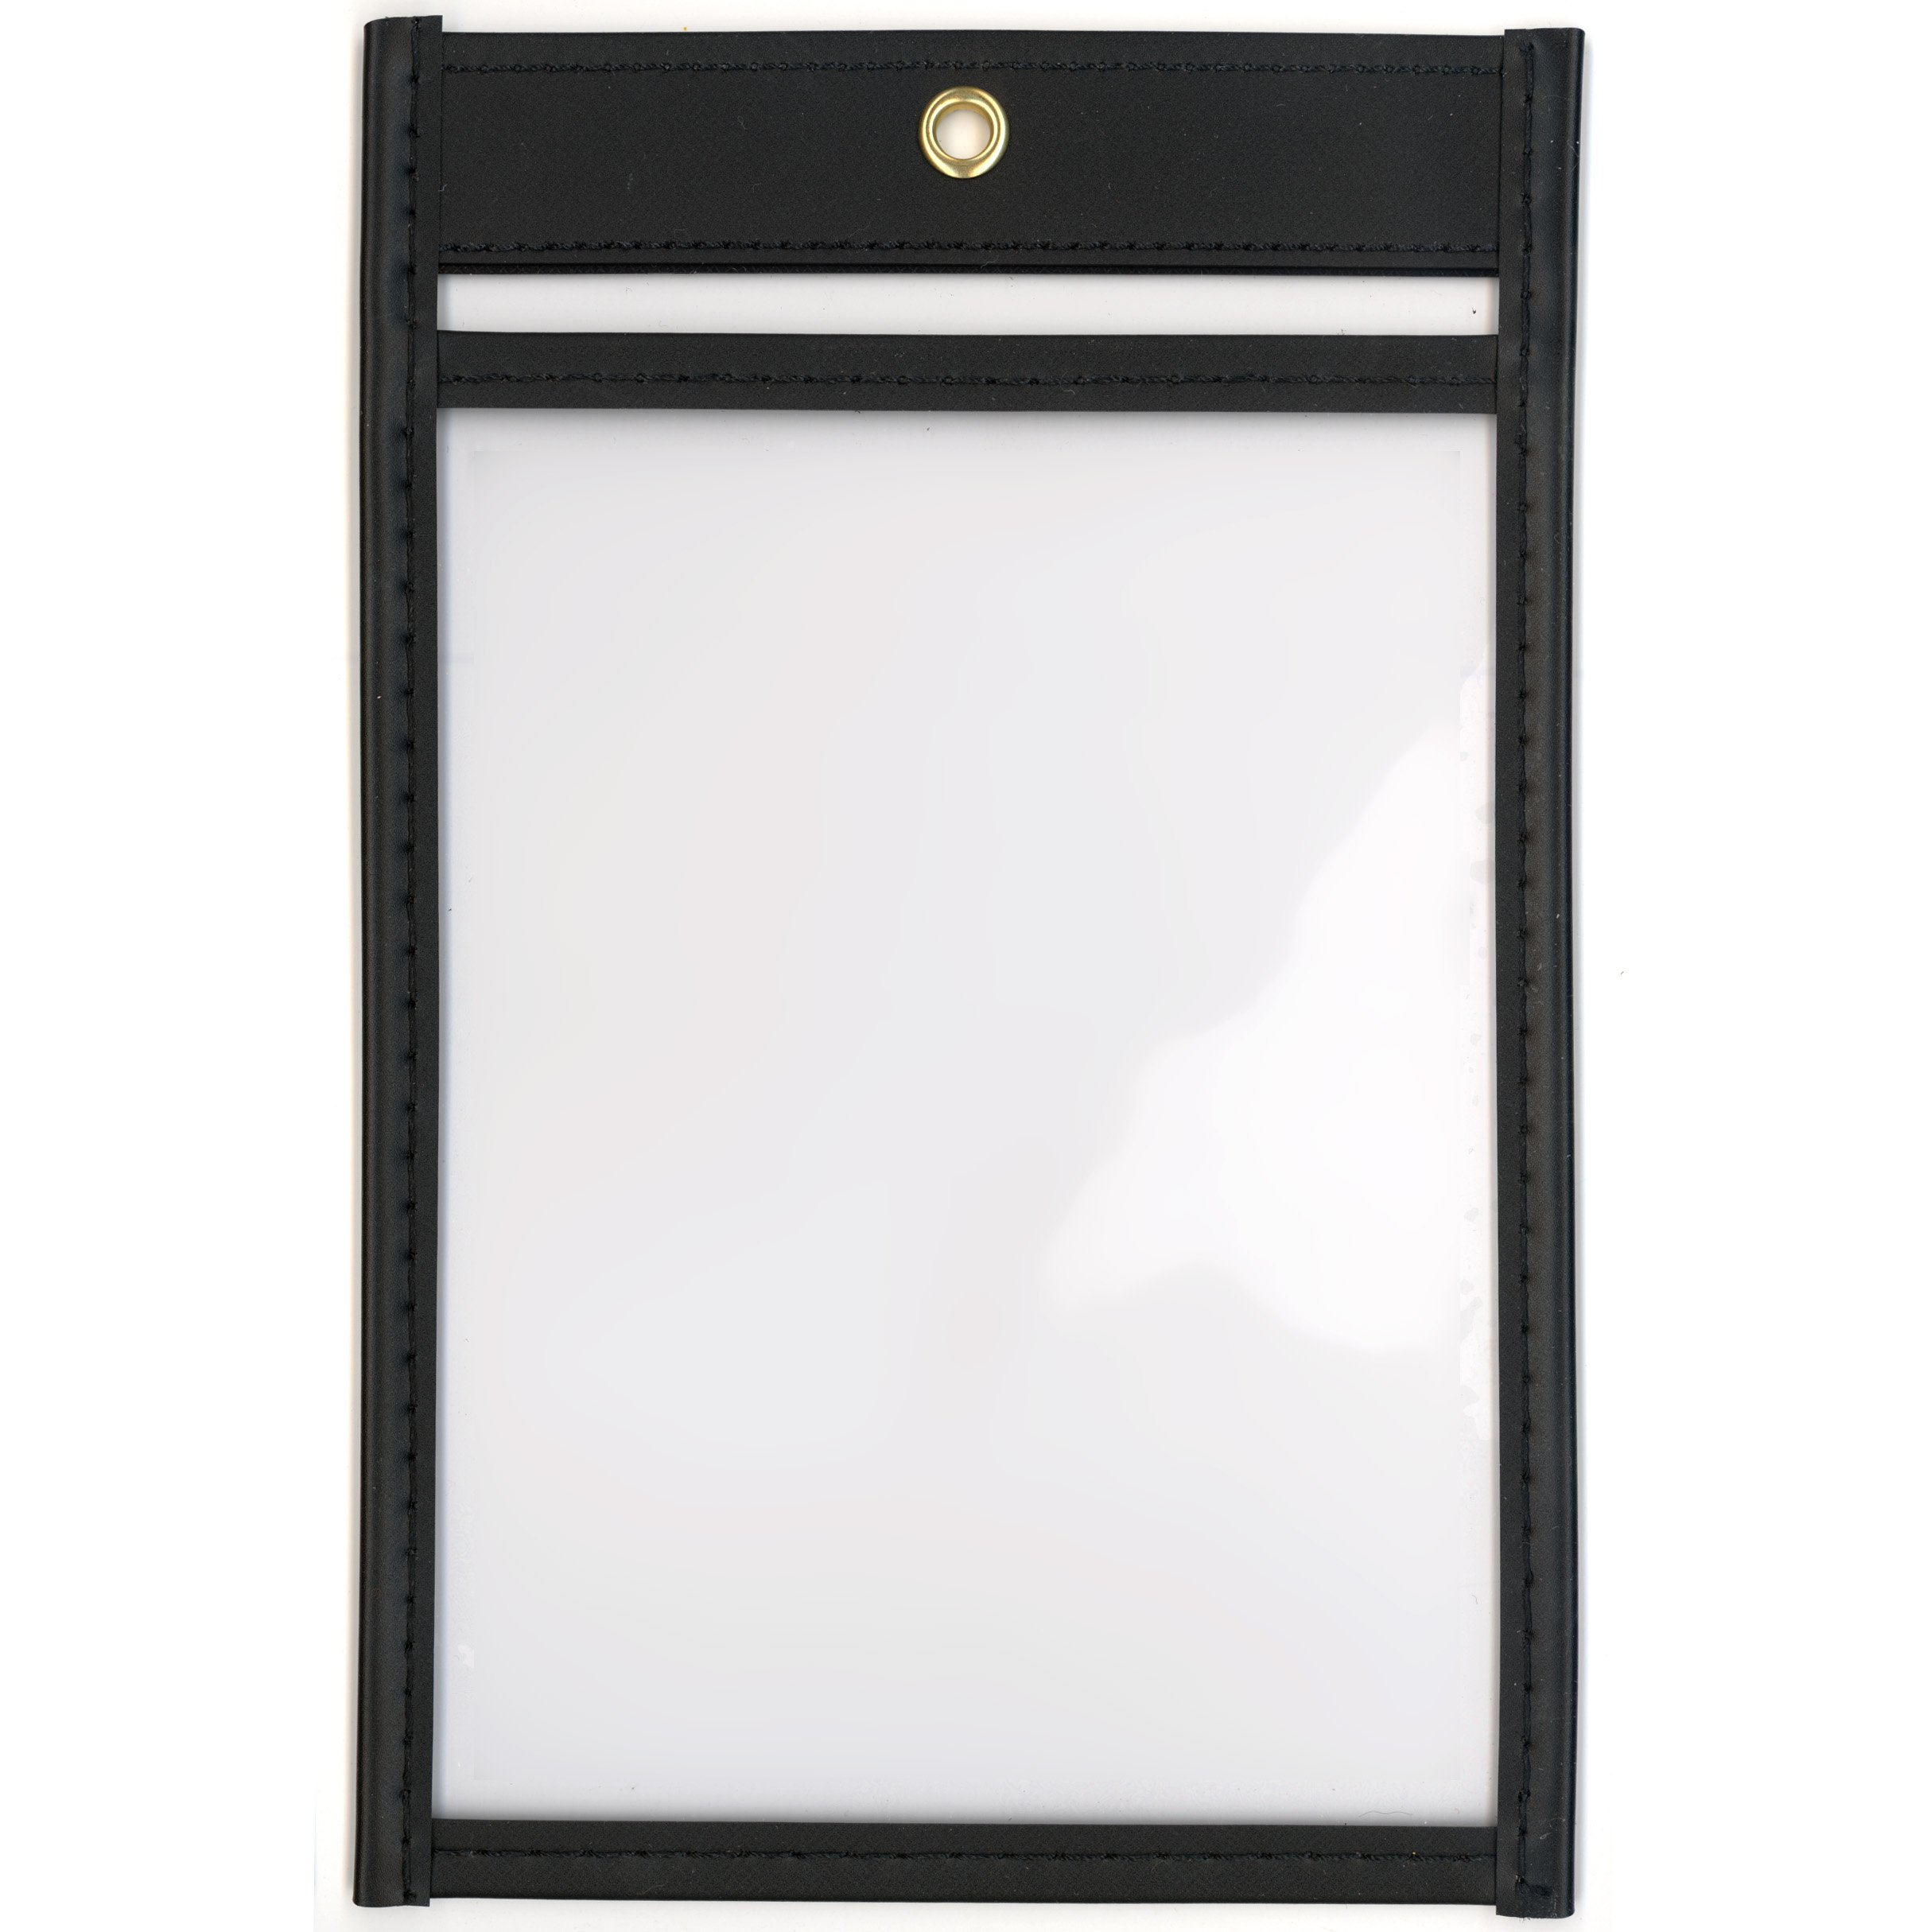 StoreSMART - 4'' x 6'' - Open Short - Black Rigid Vinyl Sewn Pocket - 5-Pack - Photo Size - T85209S-BK-5